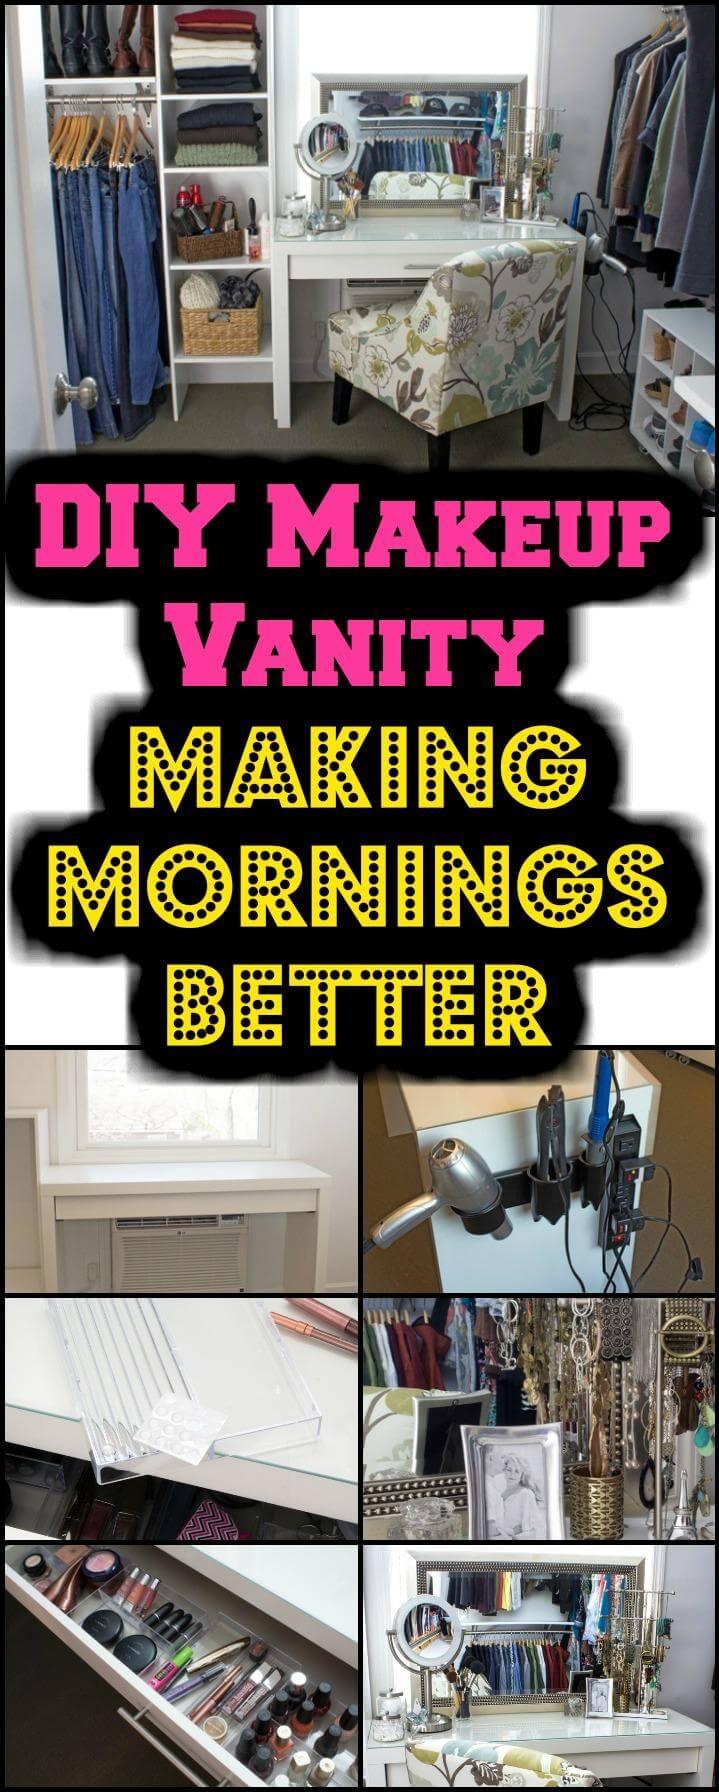 DIY makeup vanity tutorial and instructions